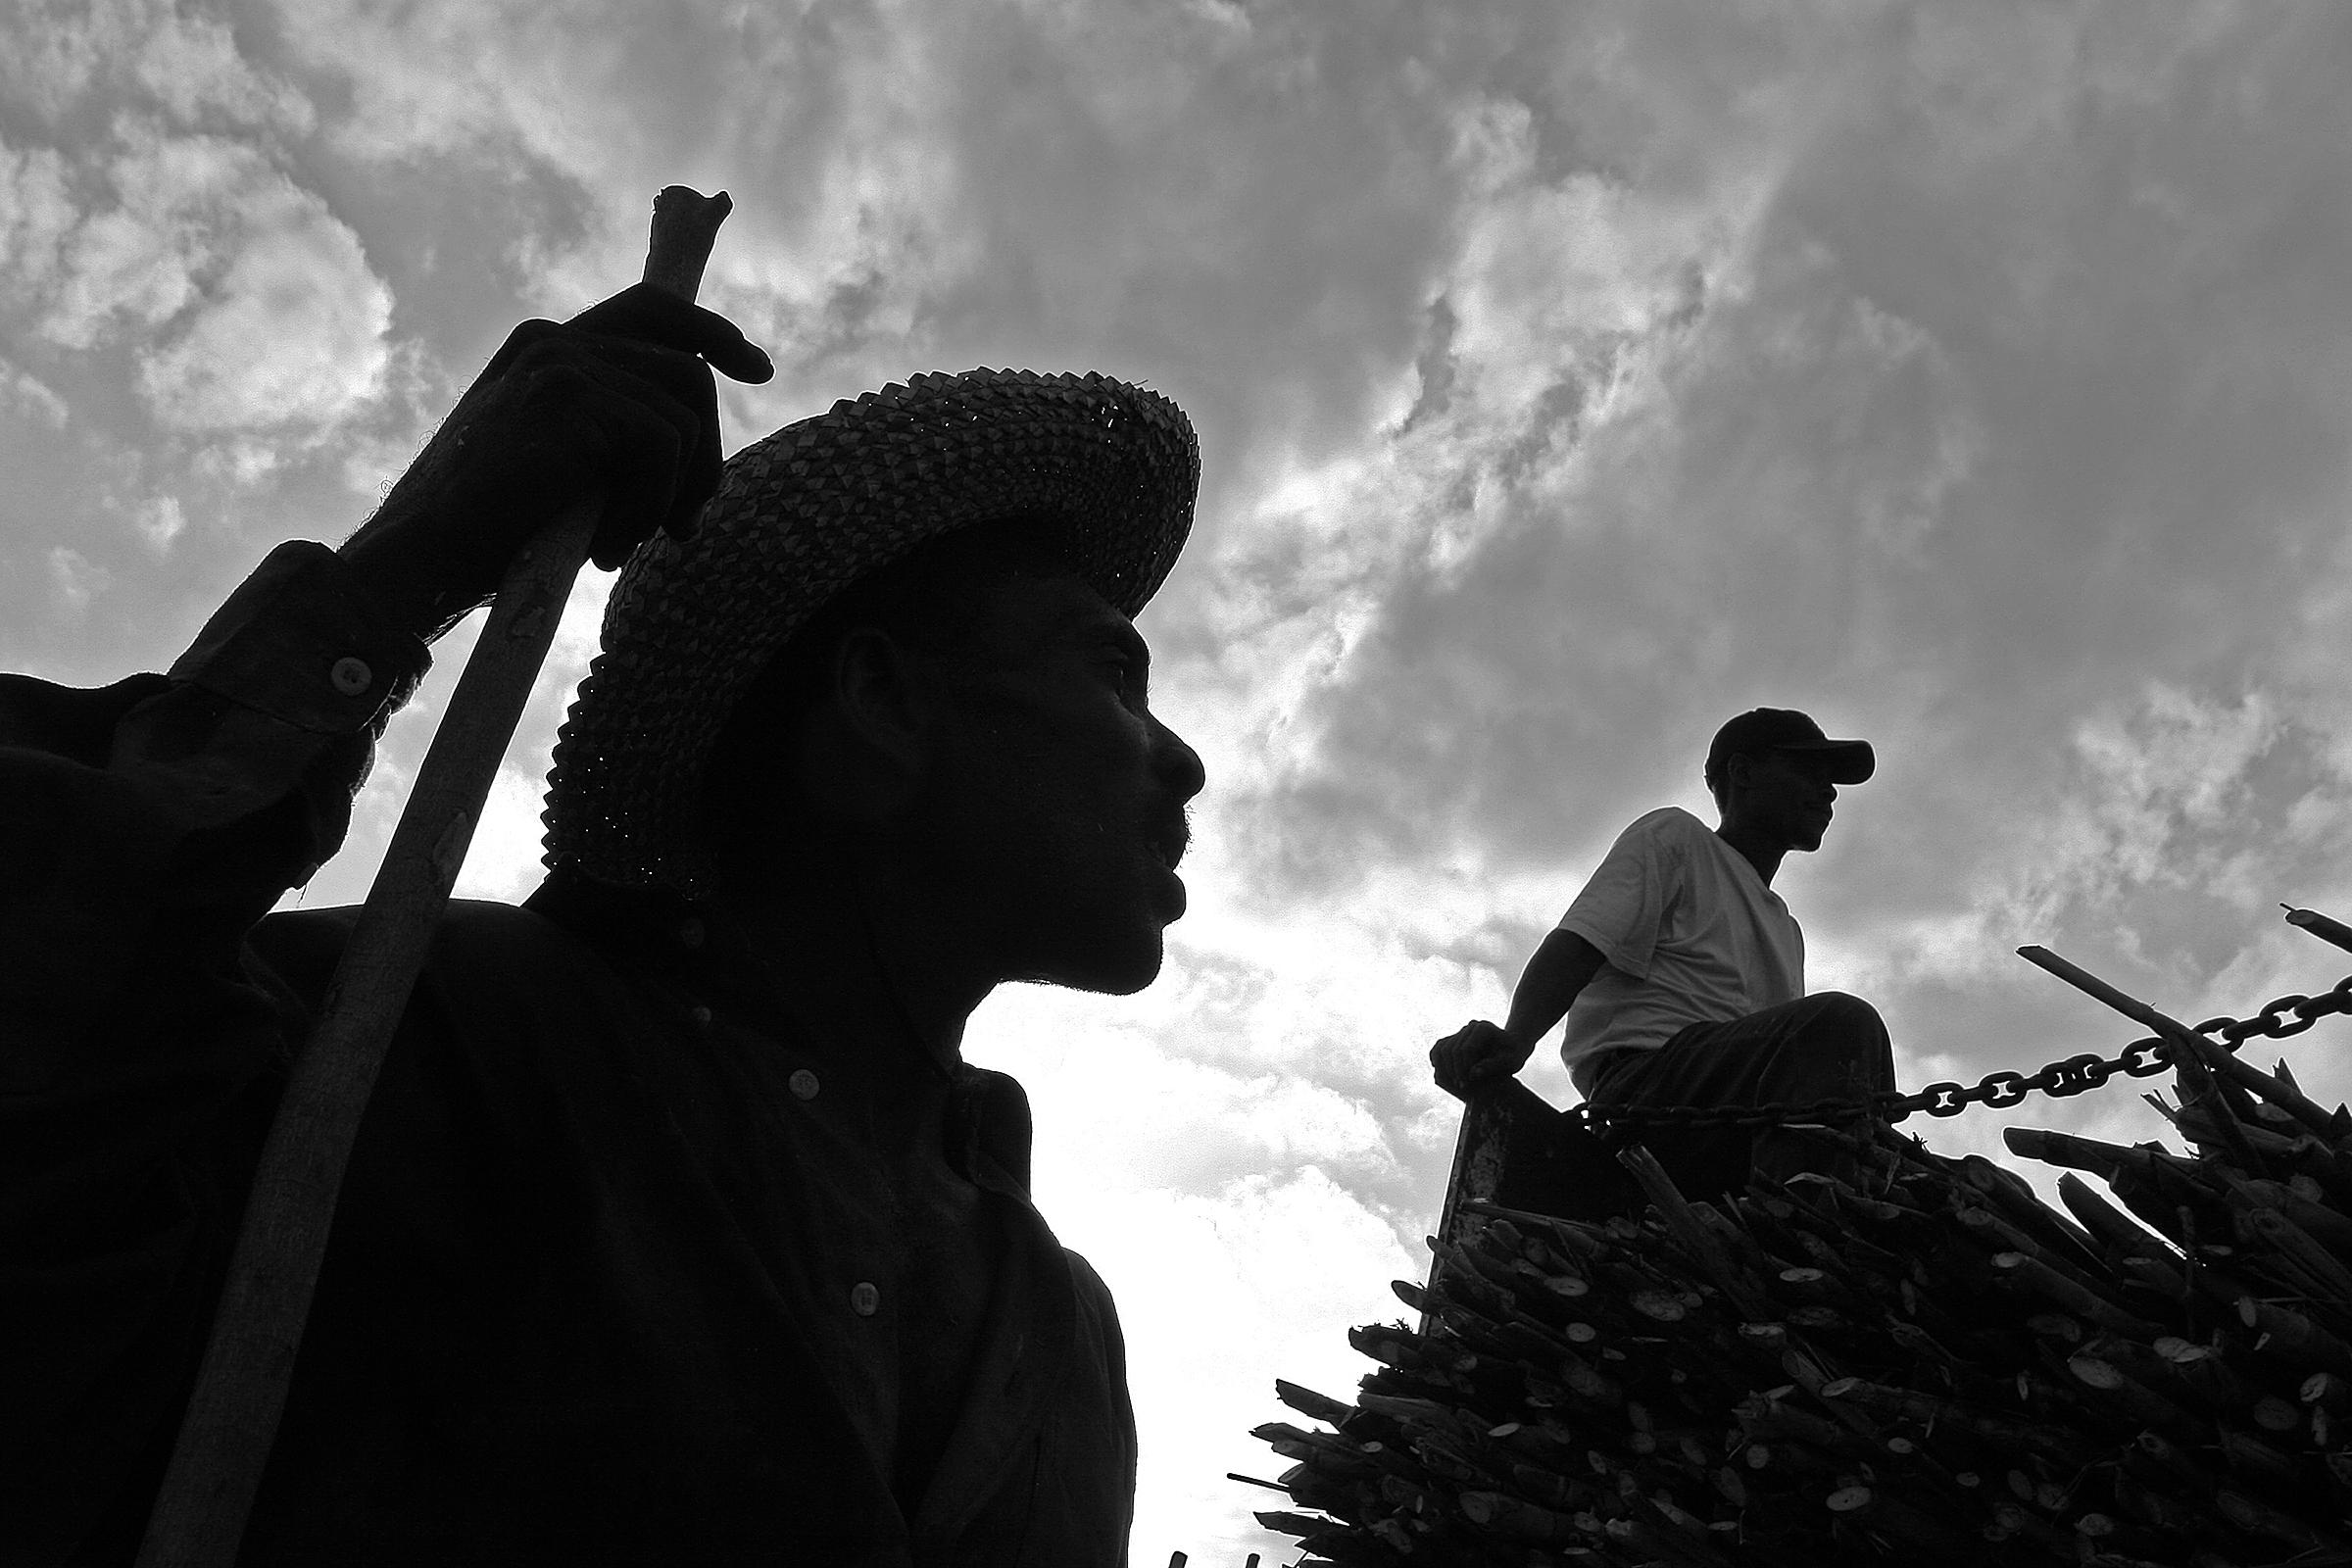 San Cristobal, República Dominicana